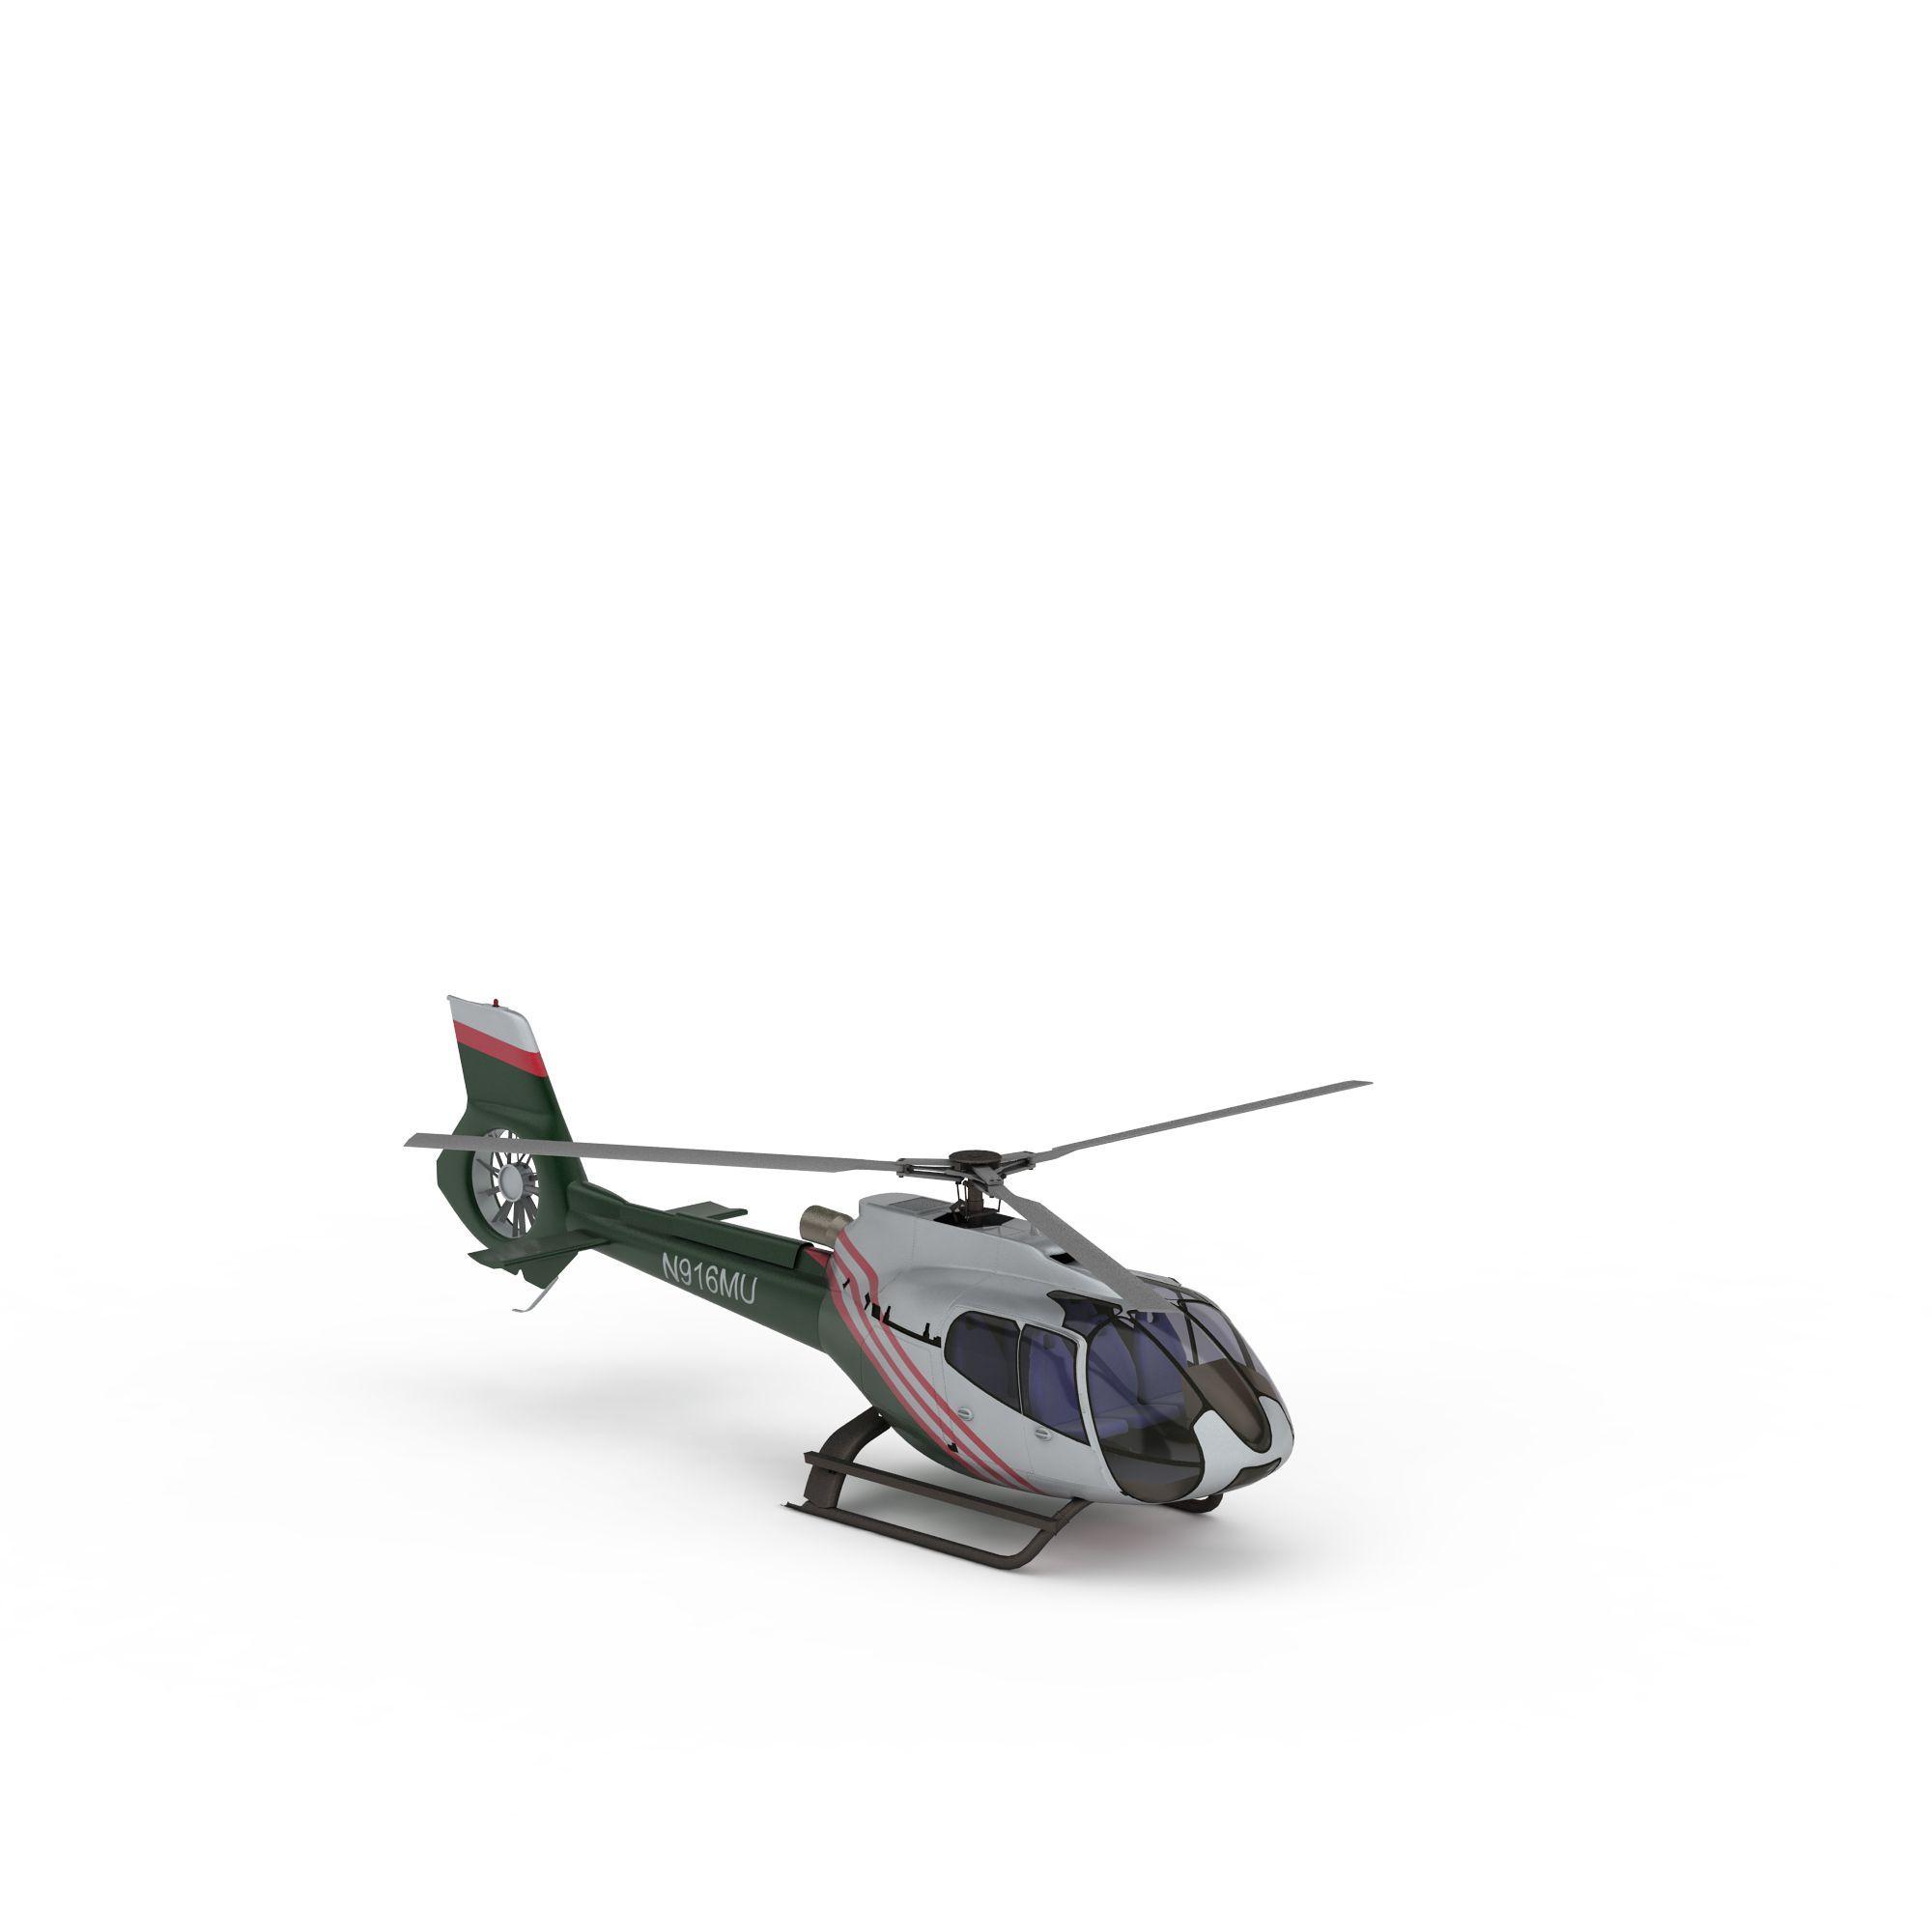 3d模型下载 交通工具3d模型 航空 直升飞机3d模型 直升飞机png图片